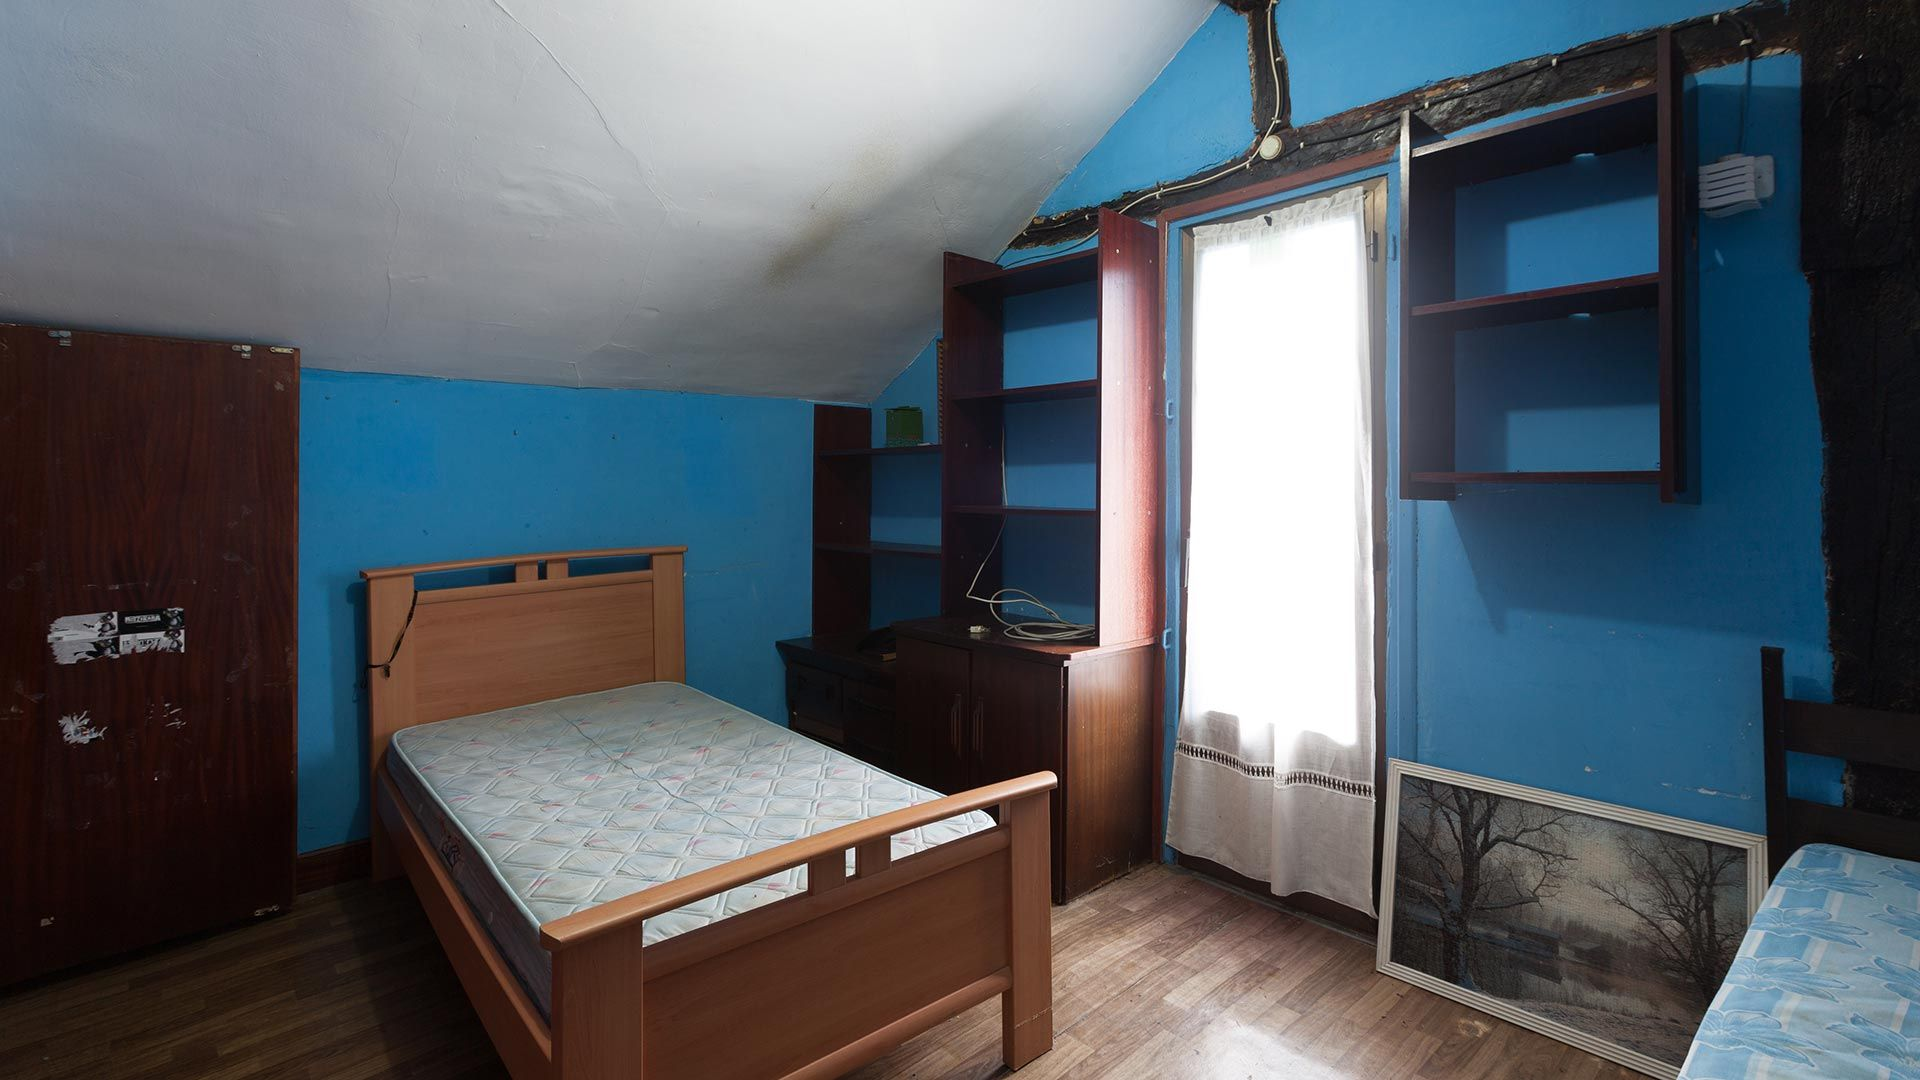 Dormitorio infantil doble antes